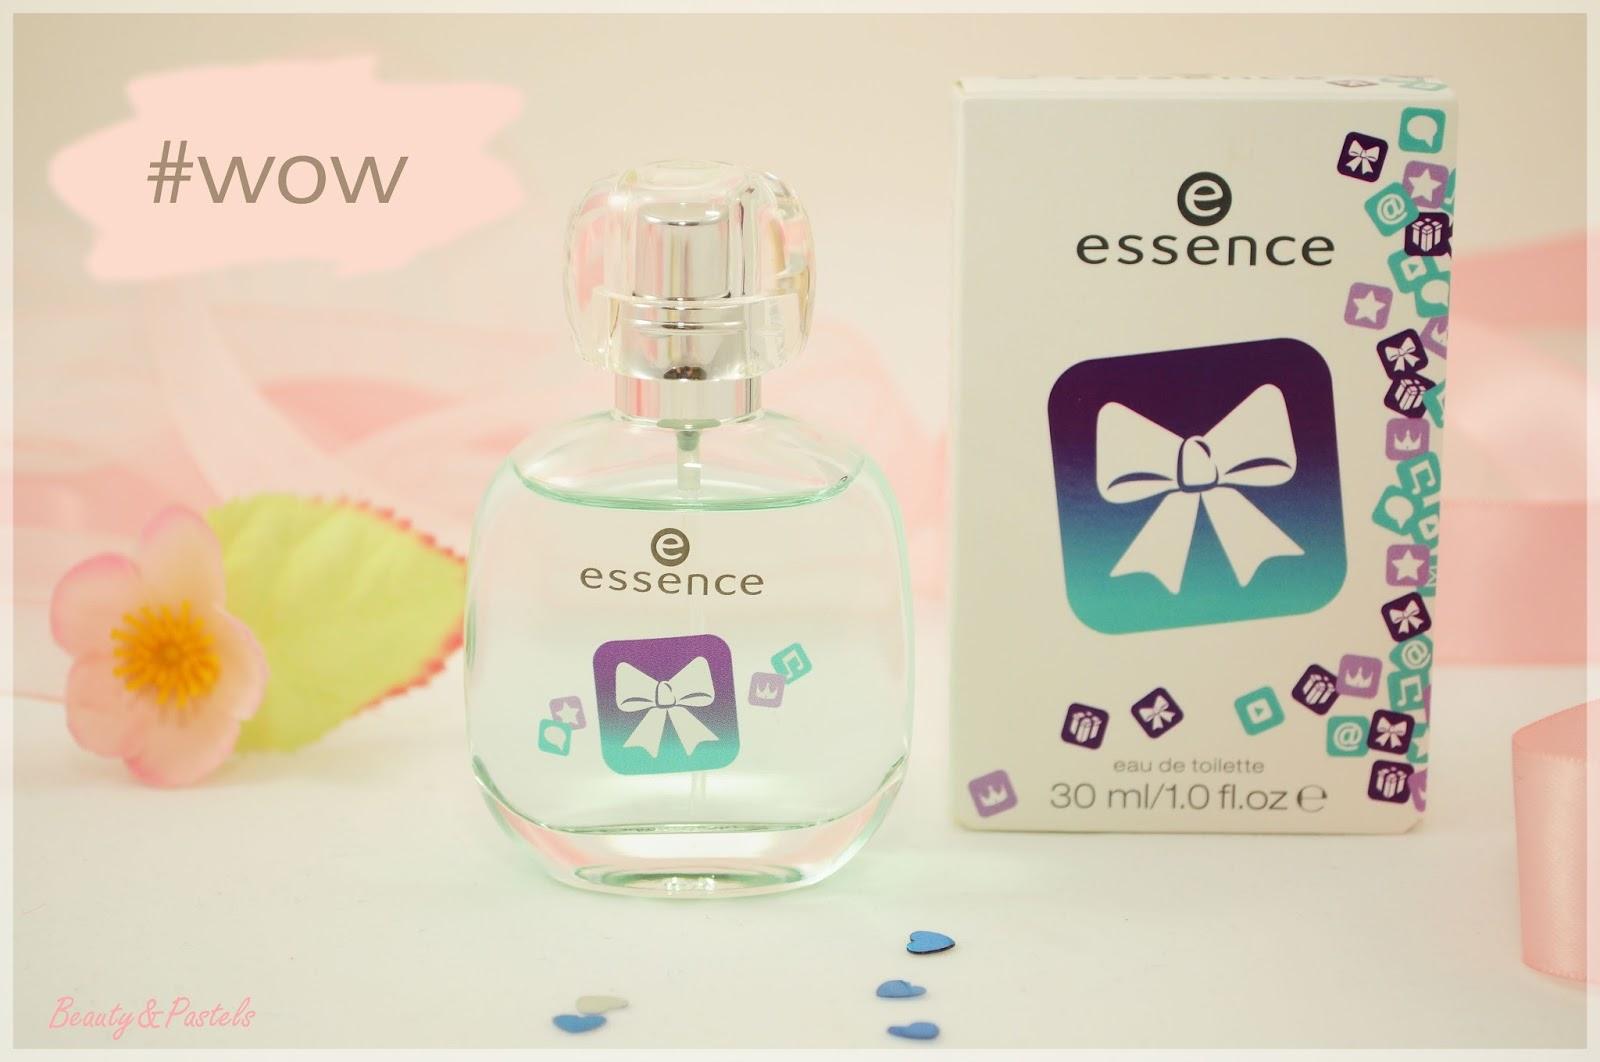 essence-Duft-wow